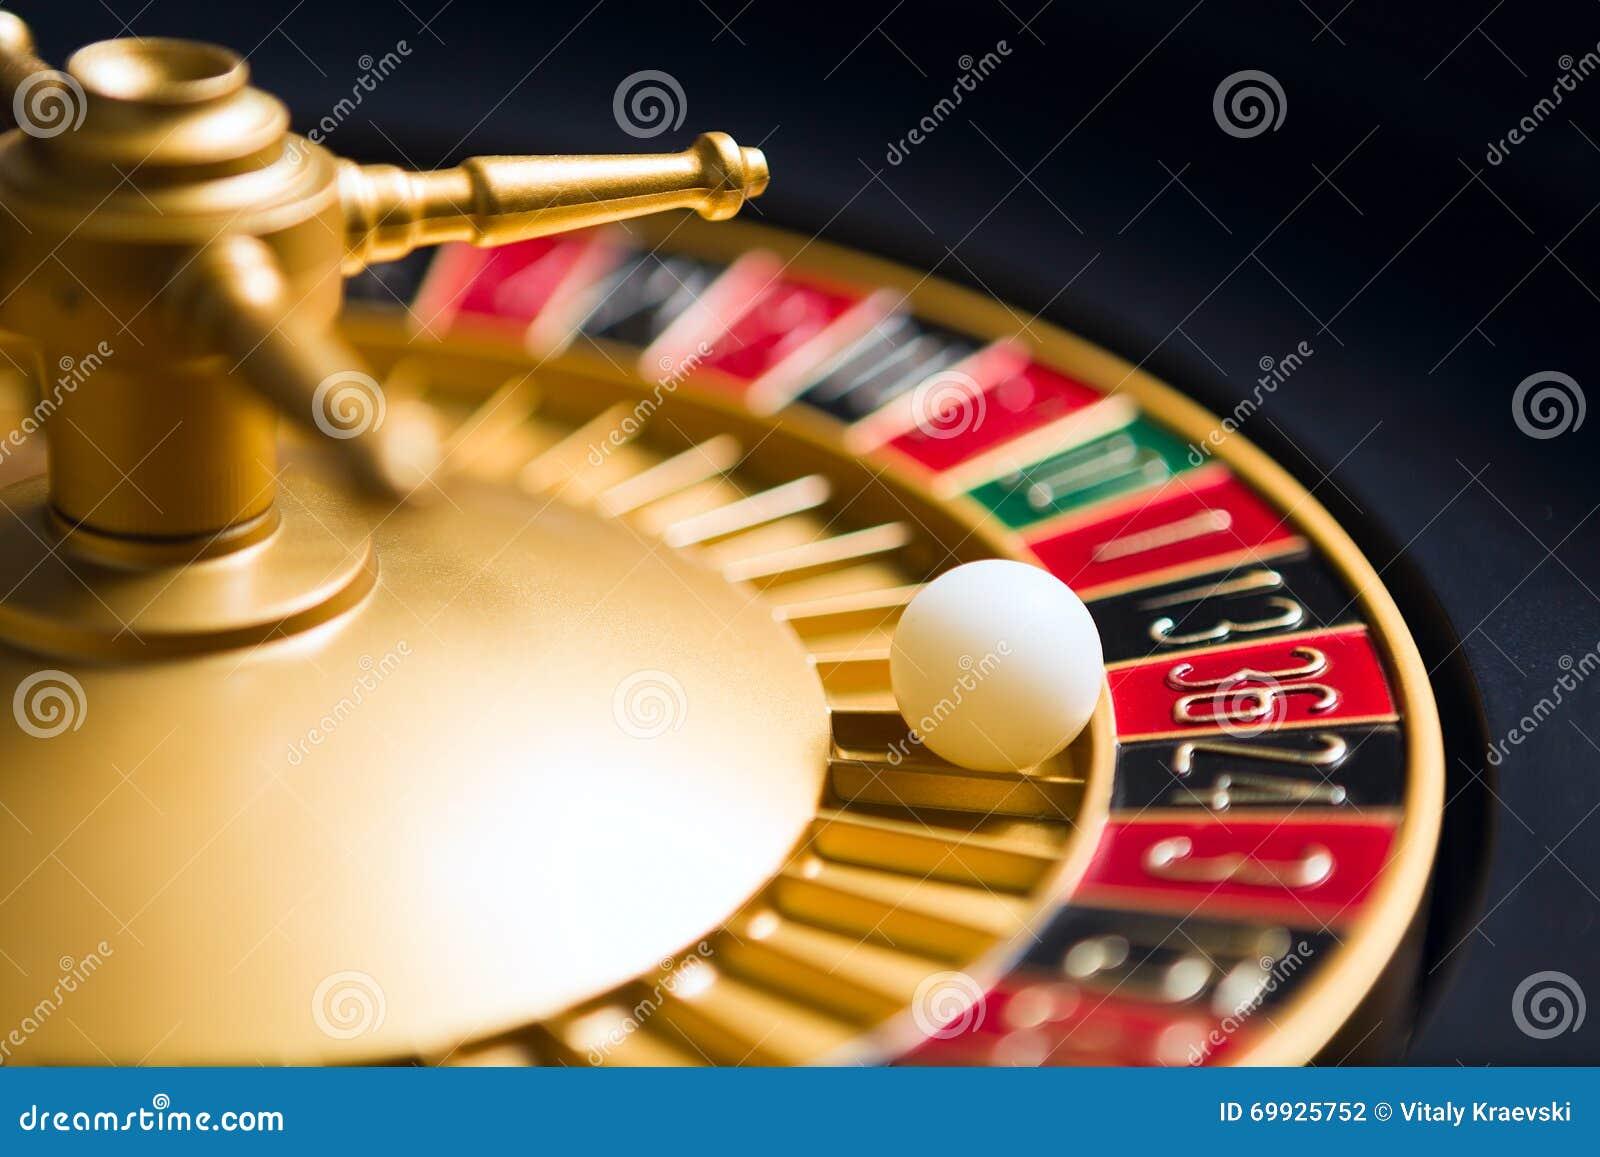 Casino numetro washington state gambling comission